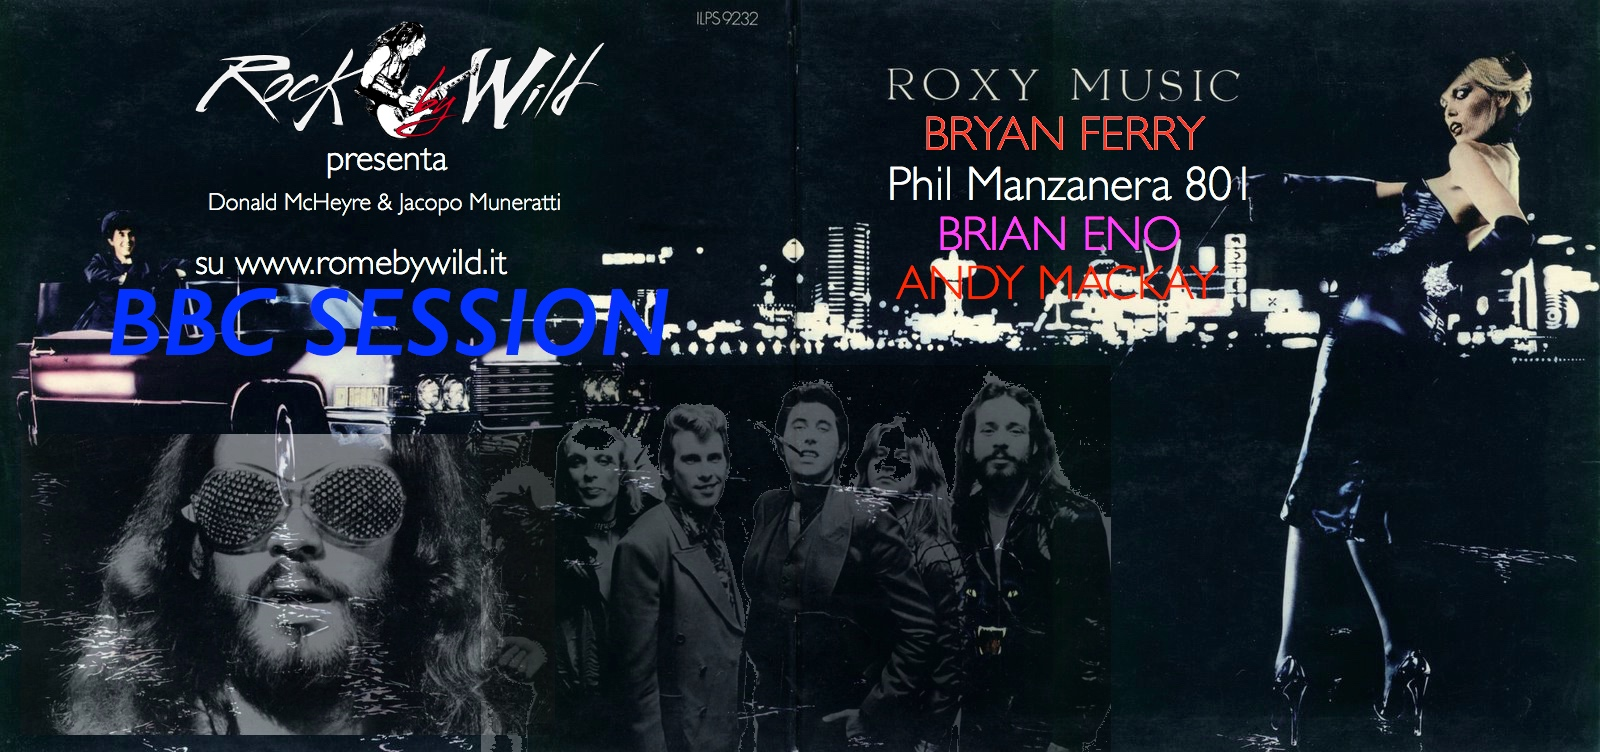 BBC session 7° Puntata: Roxy Music